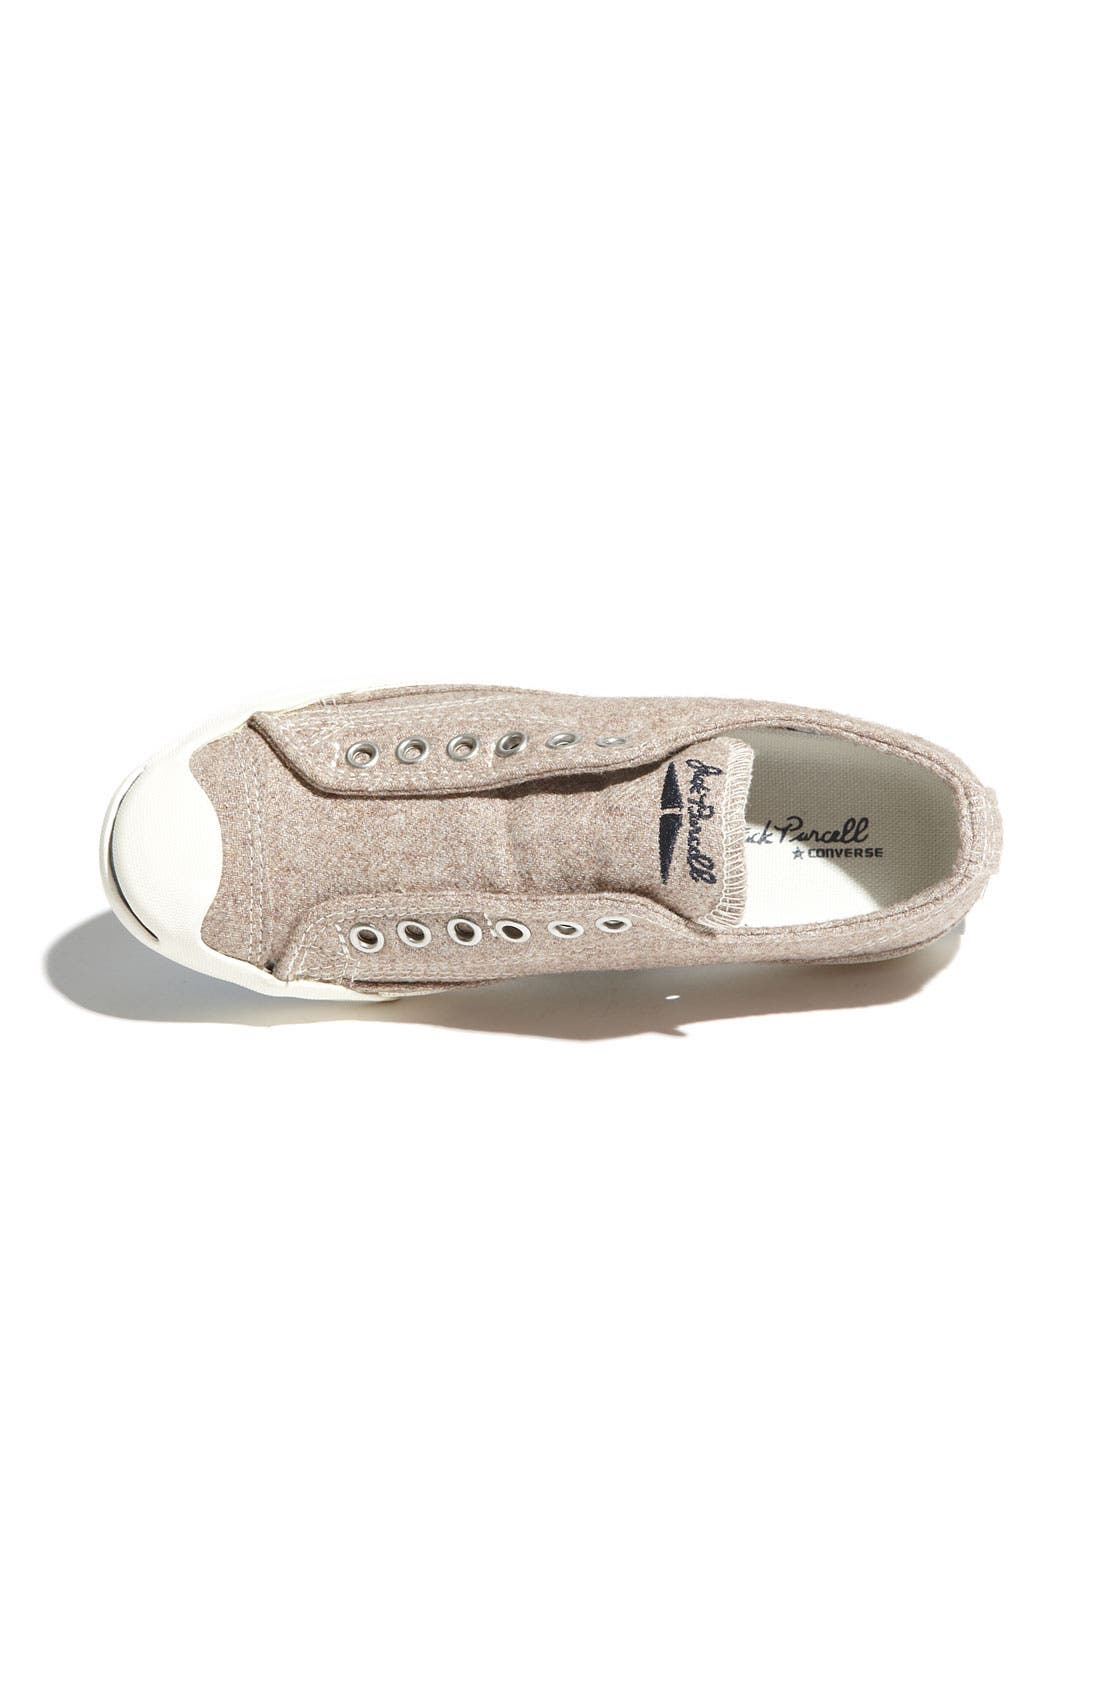 Alternate Image 3  - Converse 'Jack Purcell' Slip-On Sneaker